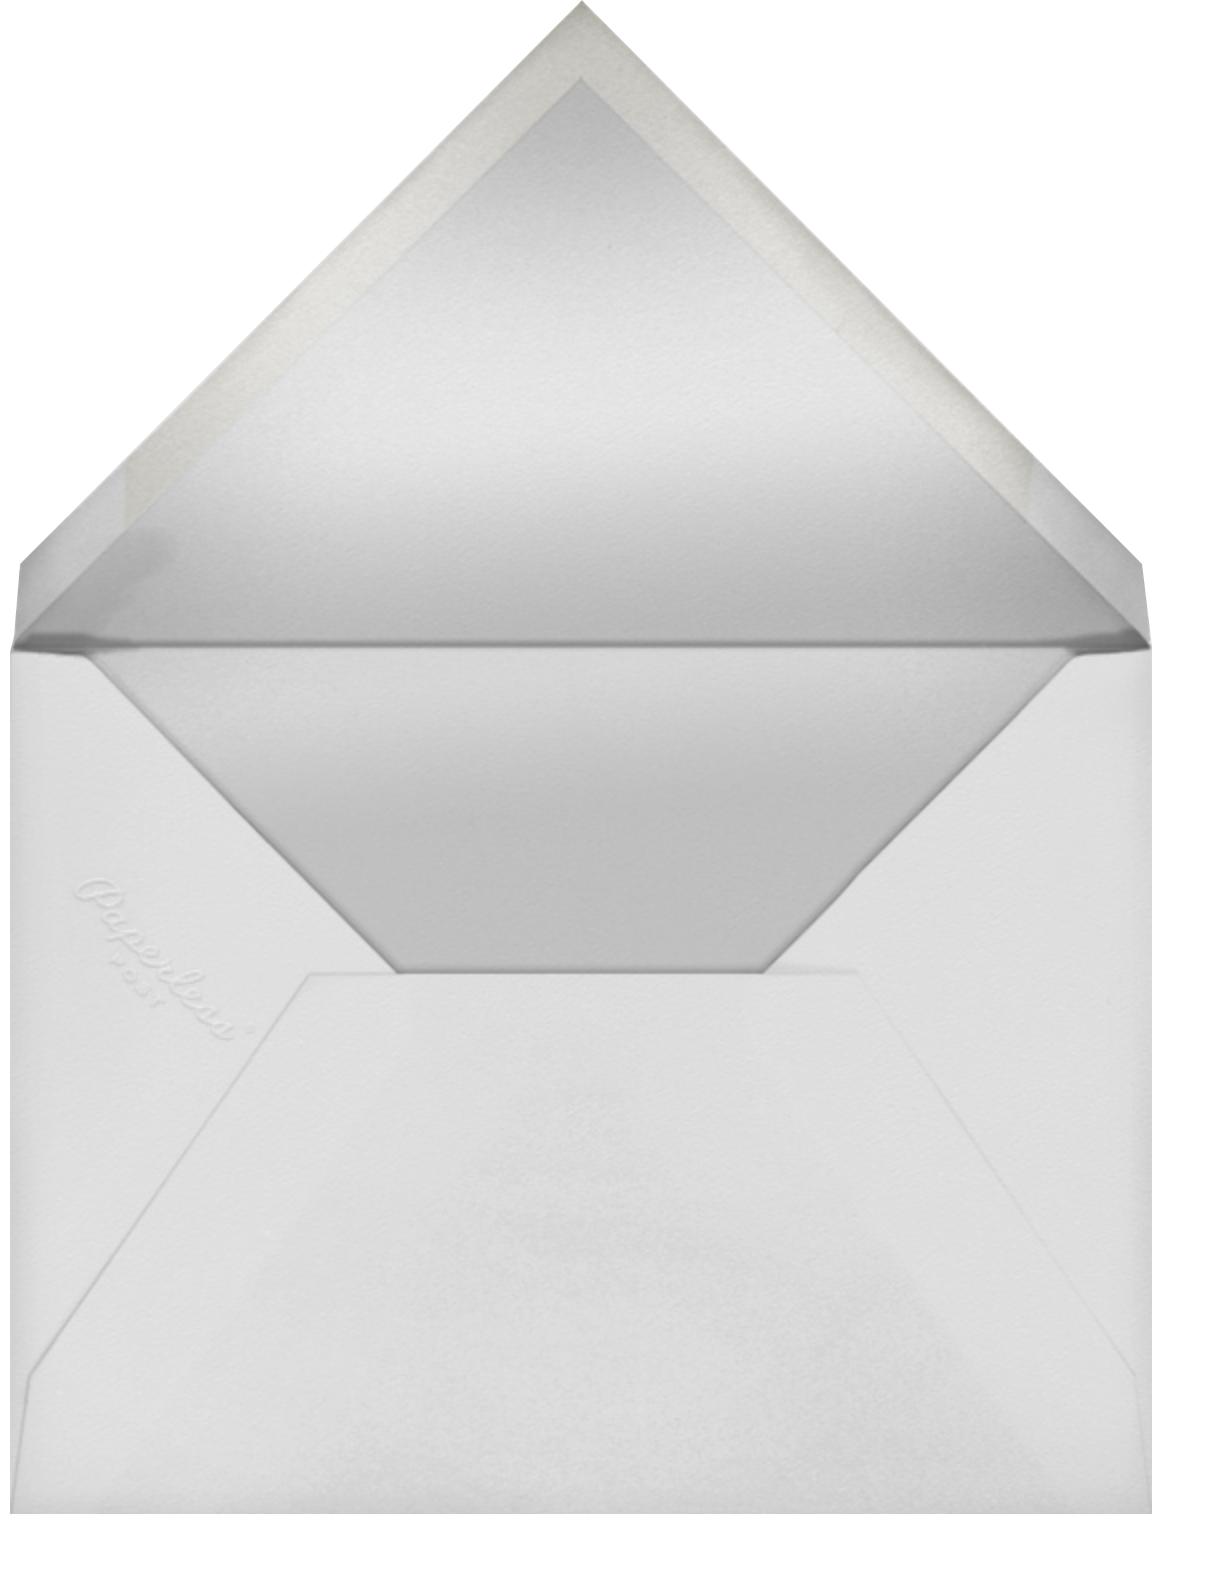 Lodden (Program) - Gray - Liberty - Envelope